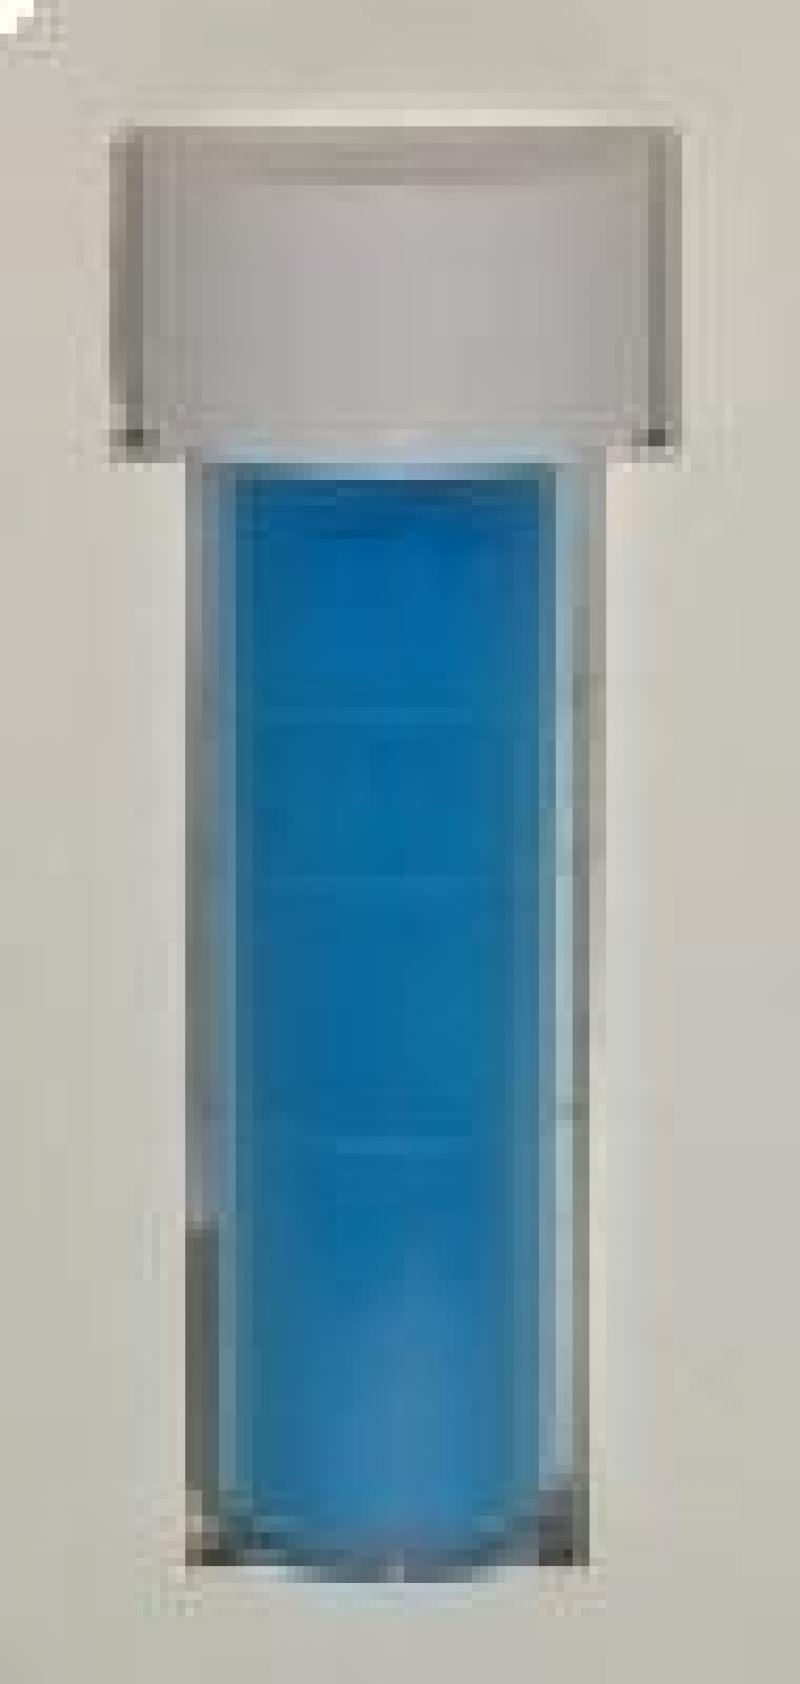 prášková farba nebeská modrá /Petal blue/